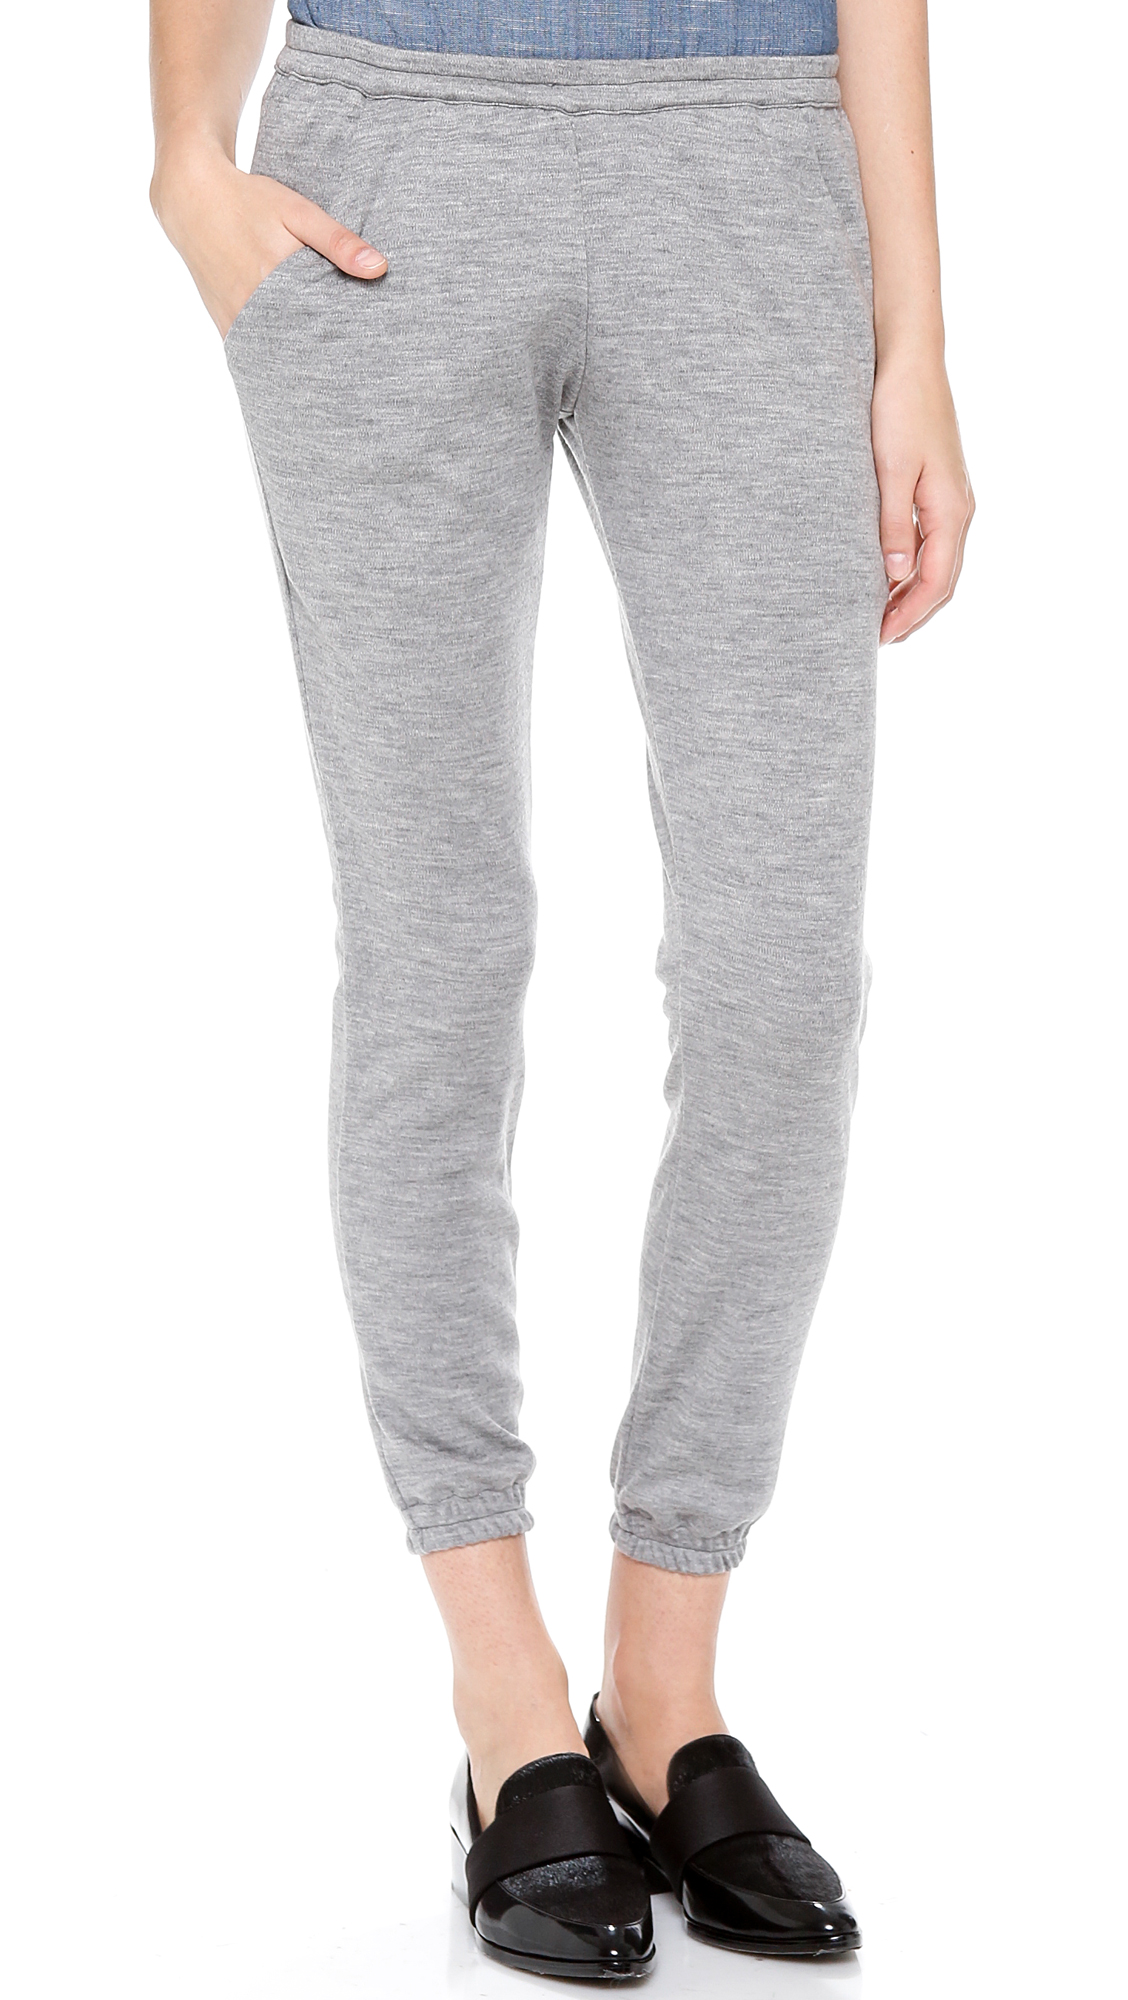 d847ef502c5c3 Lyst - Heidi Merrick Cashmere Sweatpants in Gray